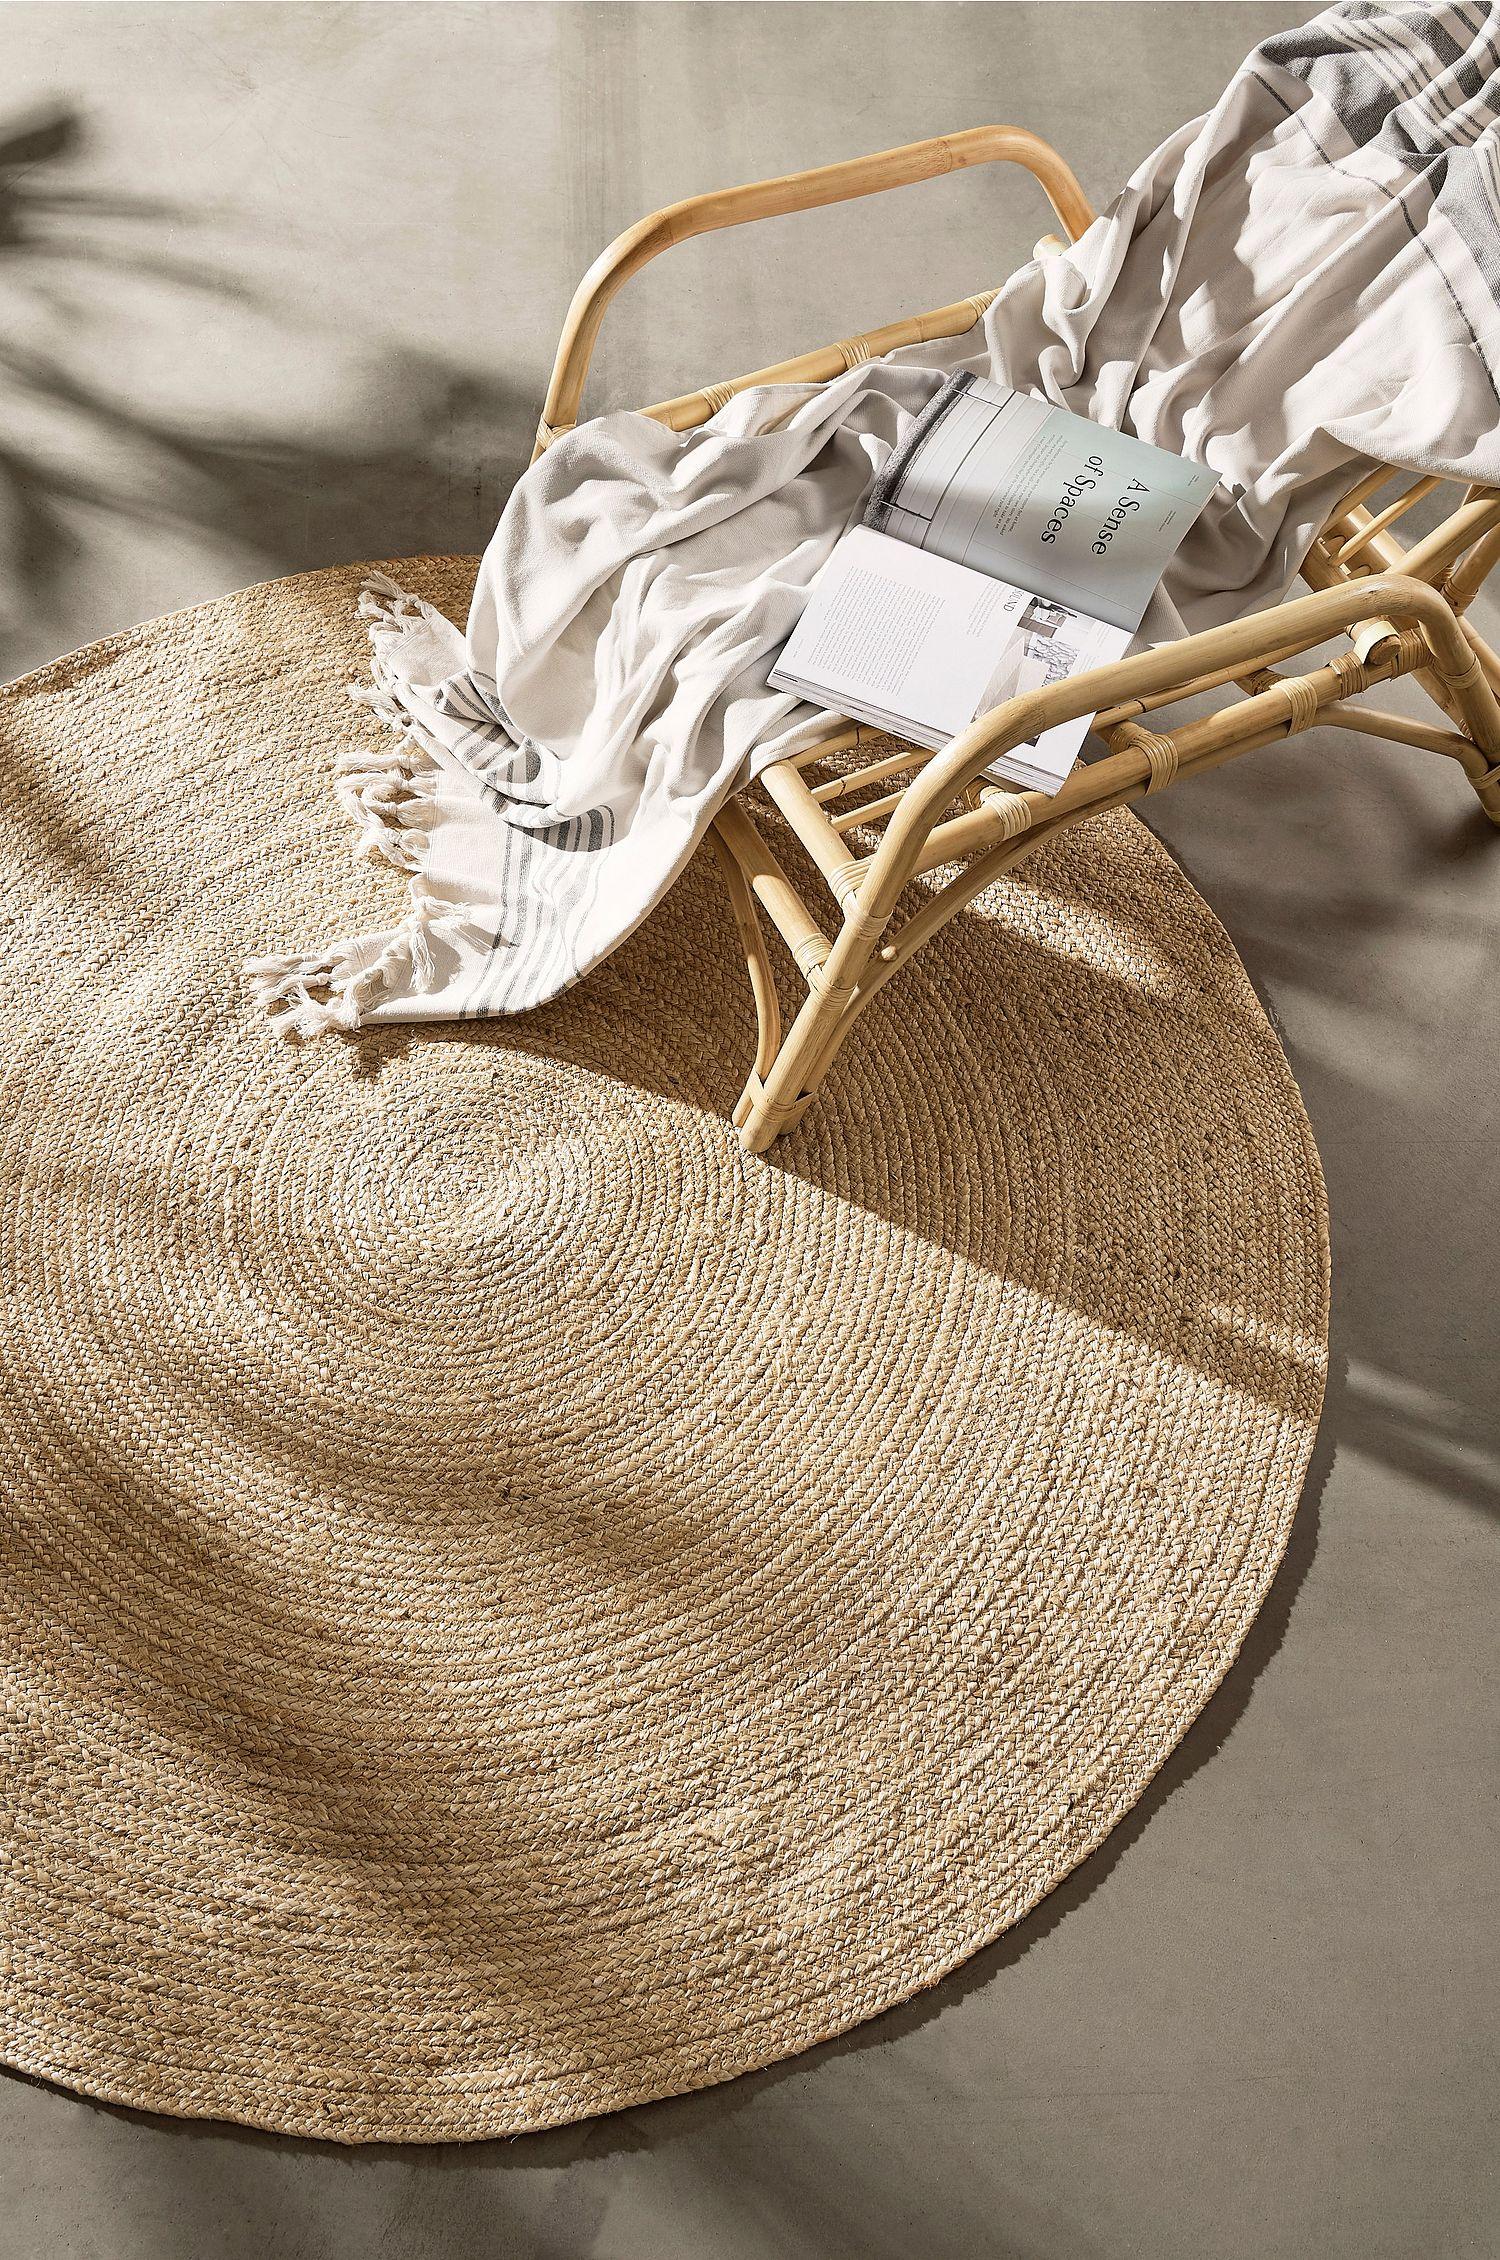 Rundt teppe i naturmateriale